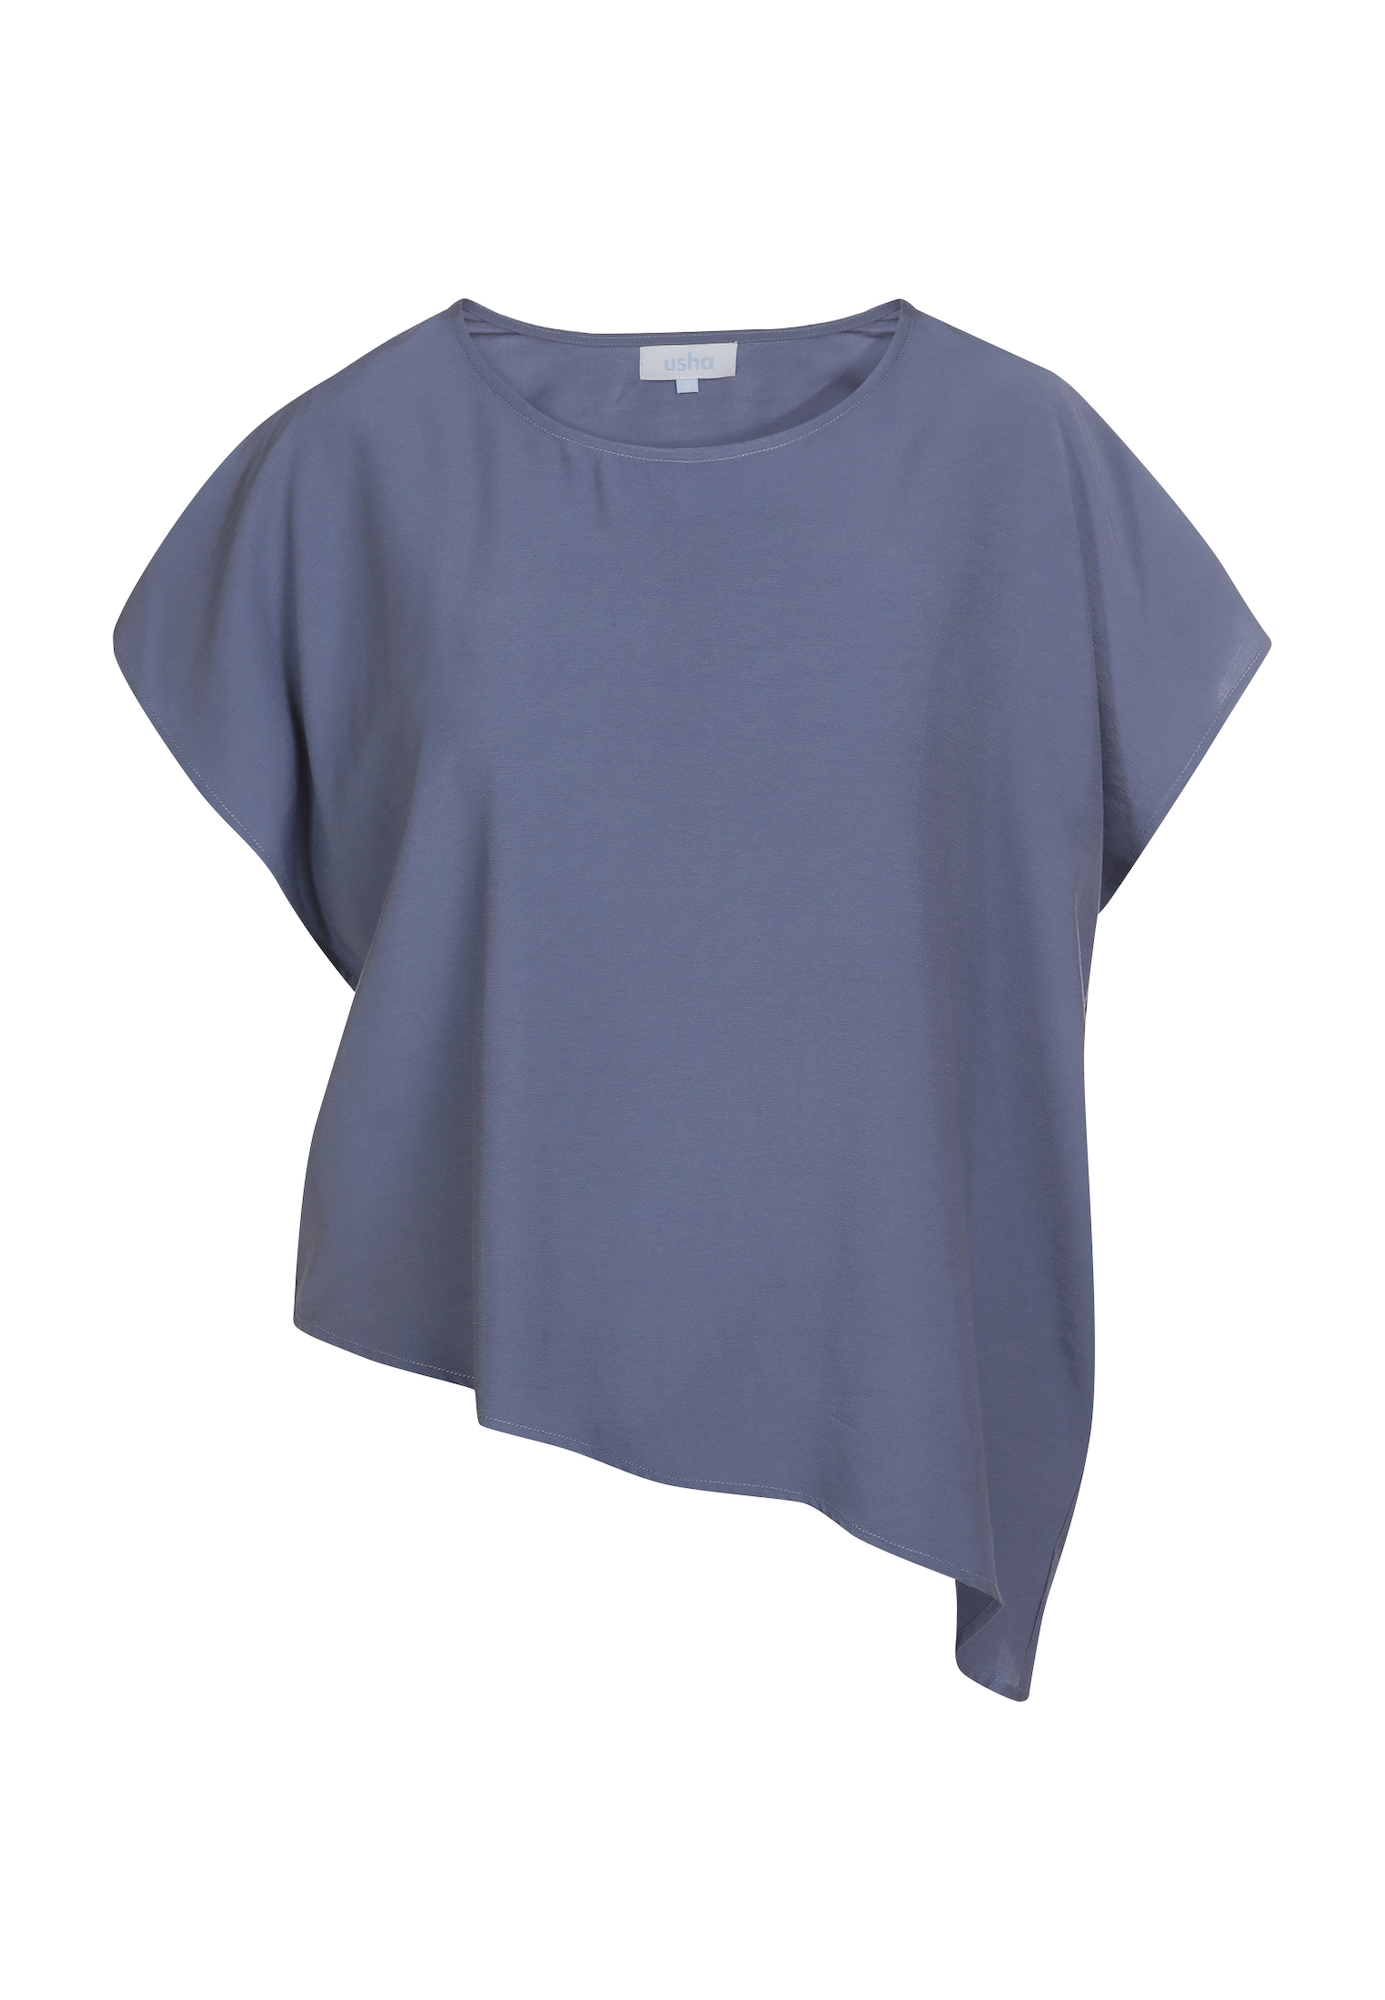 usha BLUE LABEL Marškinėliai melsvai pilka